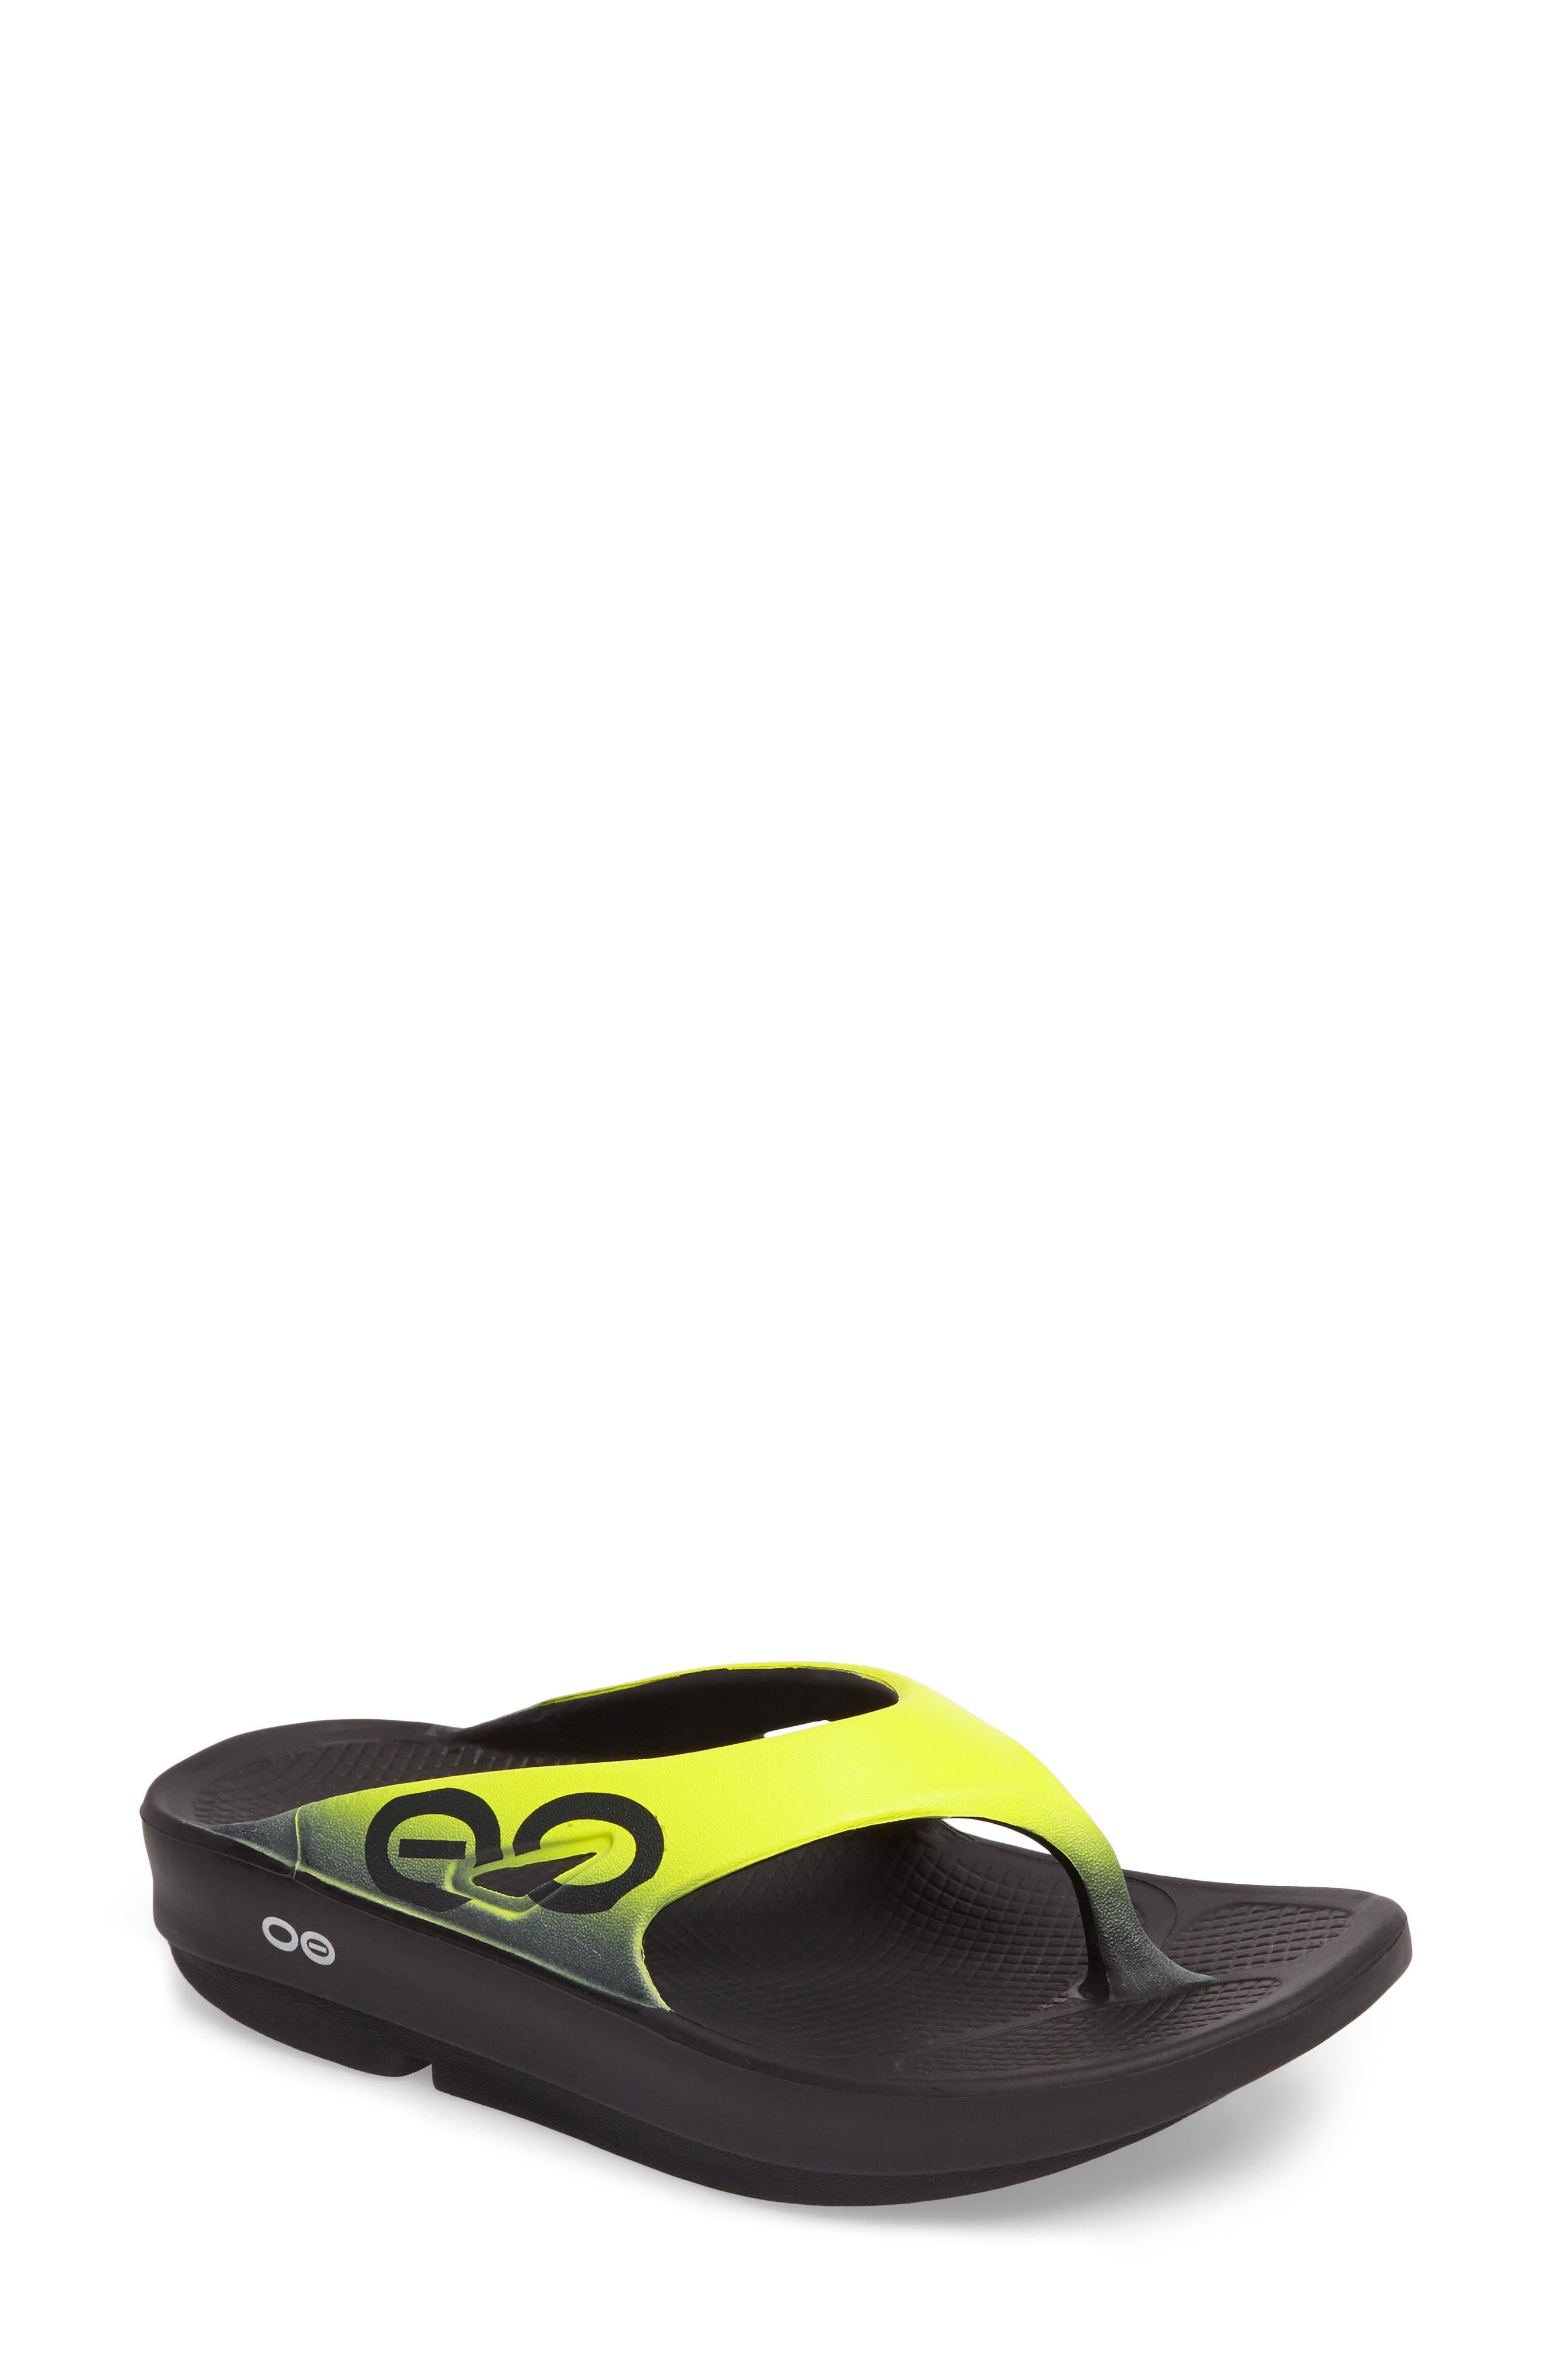 Oofos OOriginal Sport Sandal (Women)